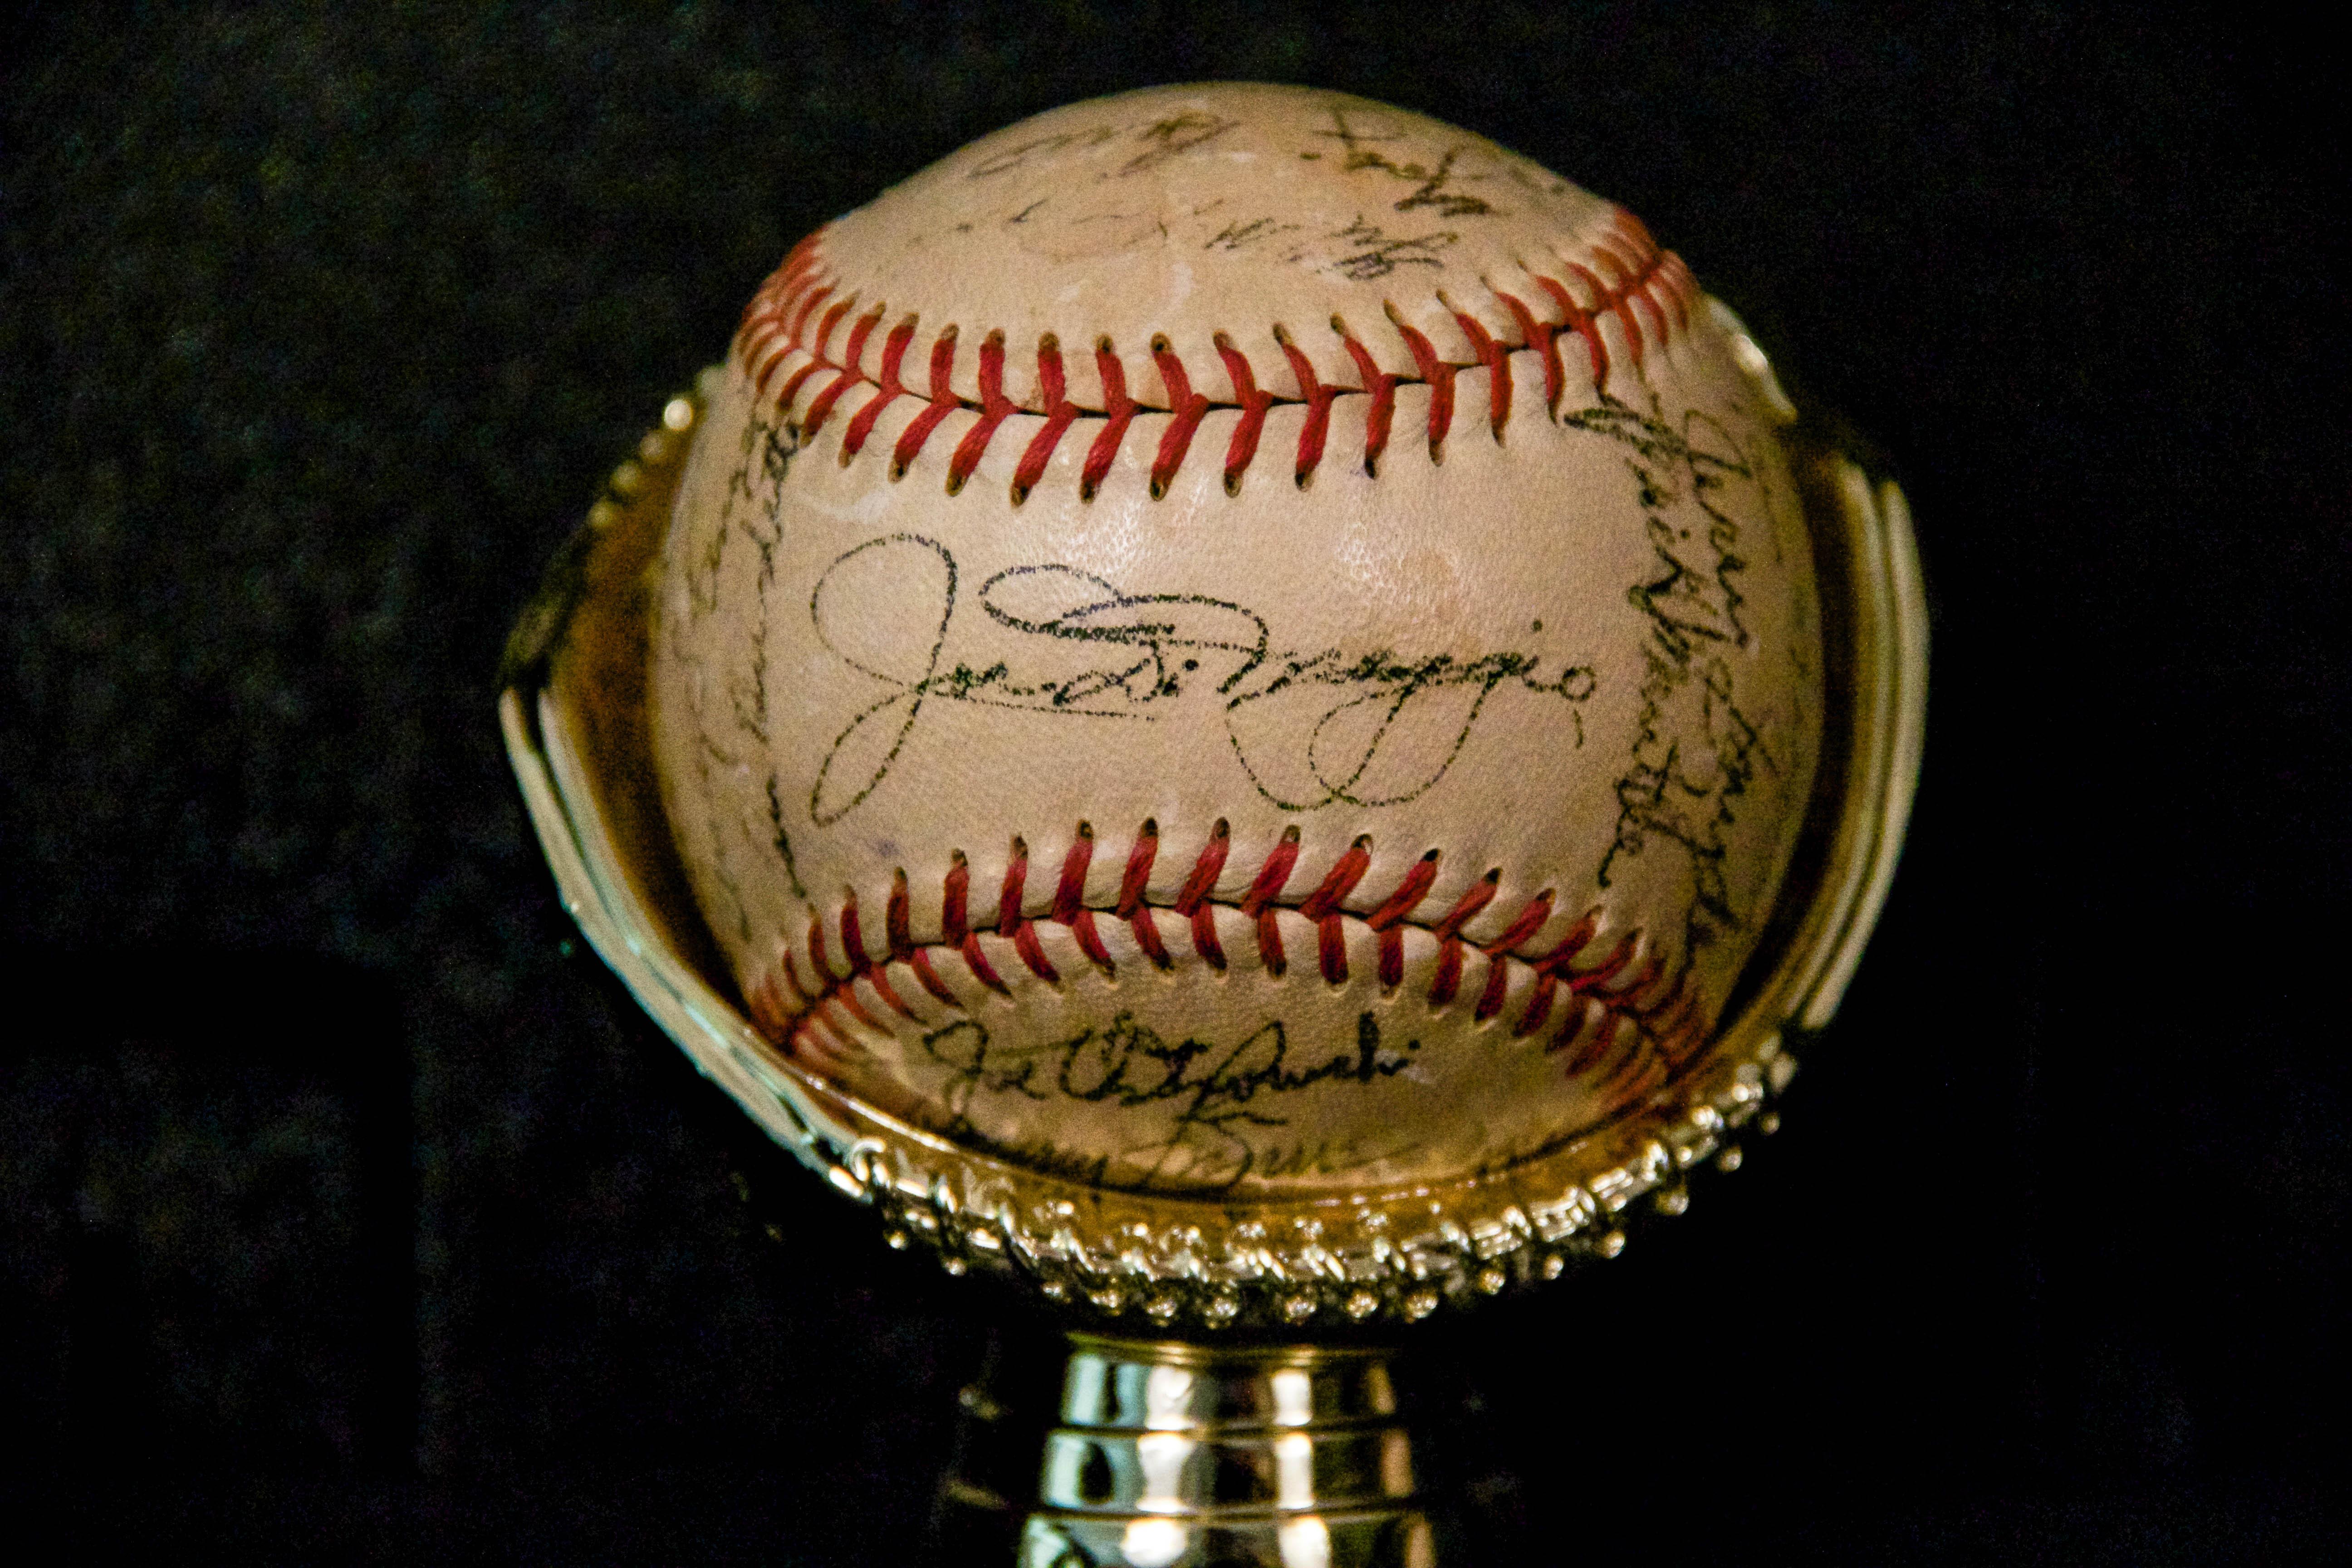 1951 World Series Champions